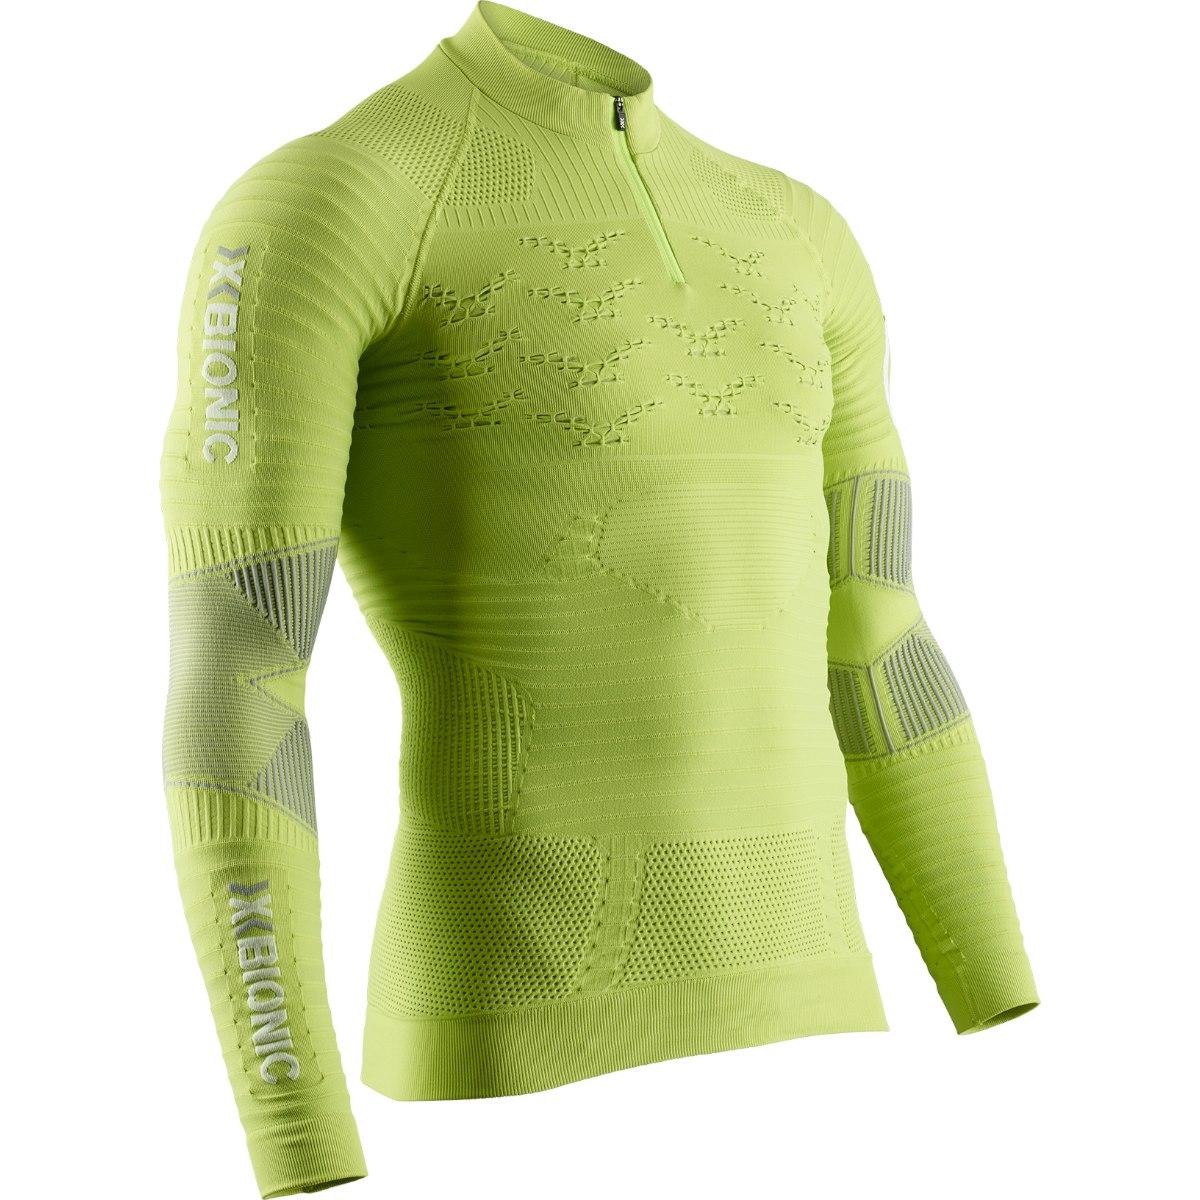 Bild von X-Bionic Effektor 4.0 Trail Run Powershirt 1/2 Zip Langarmshirt für Herren - effektor green/arctic white